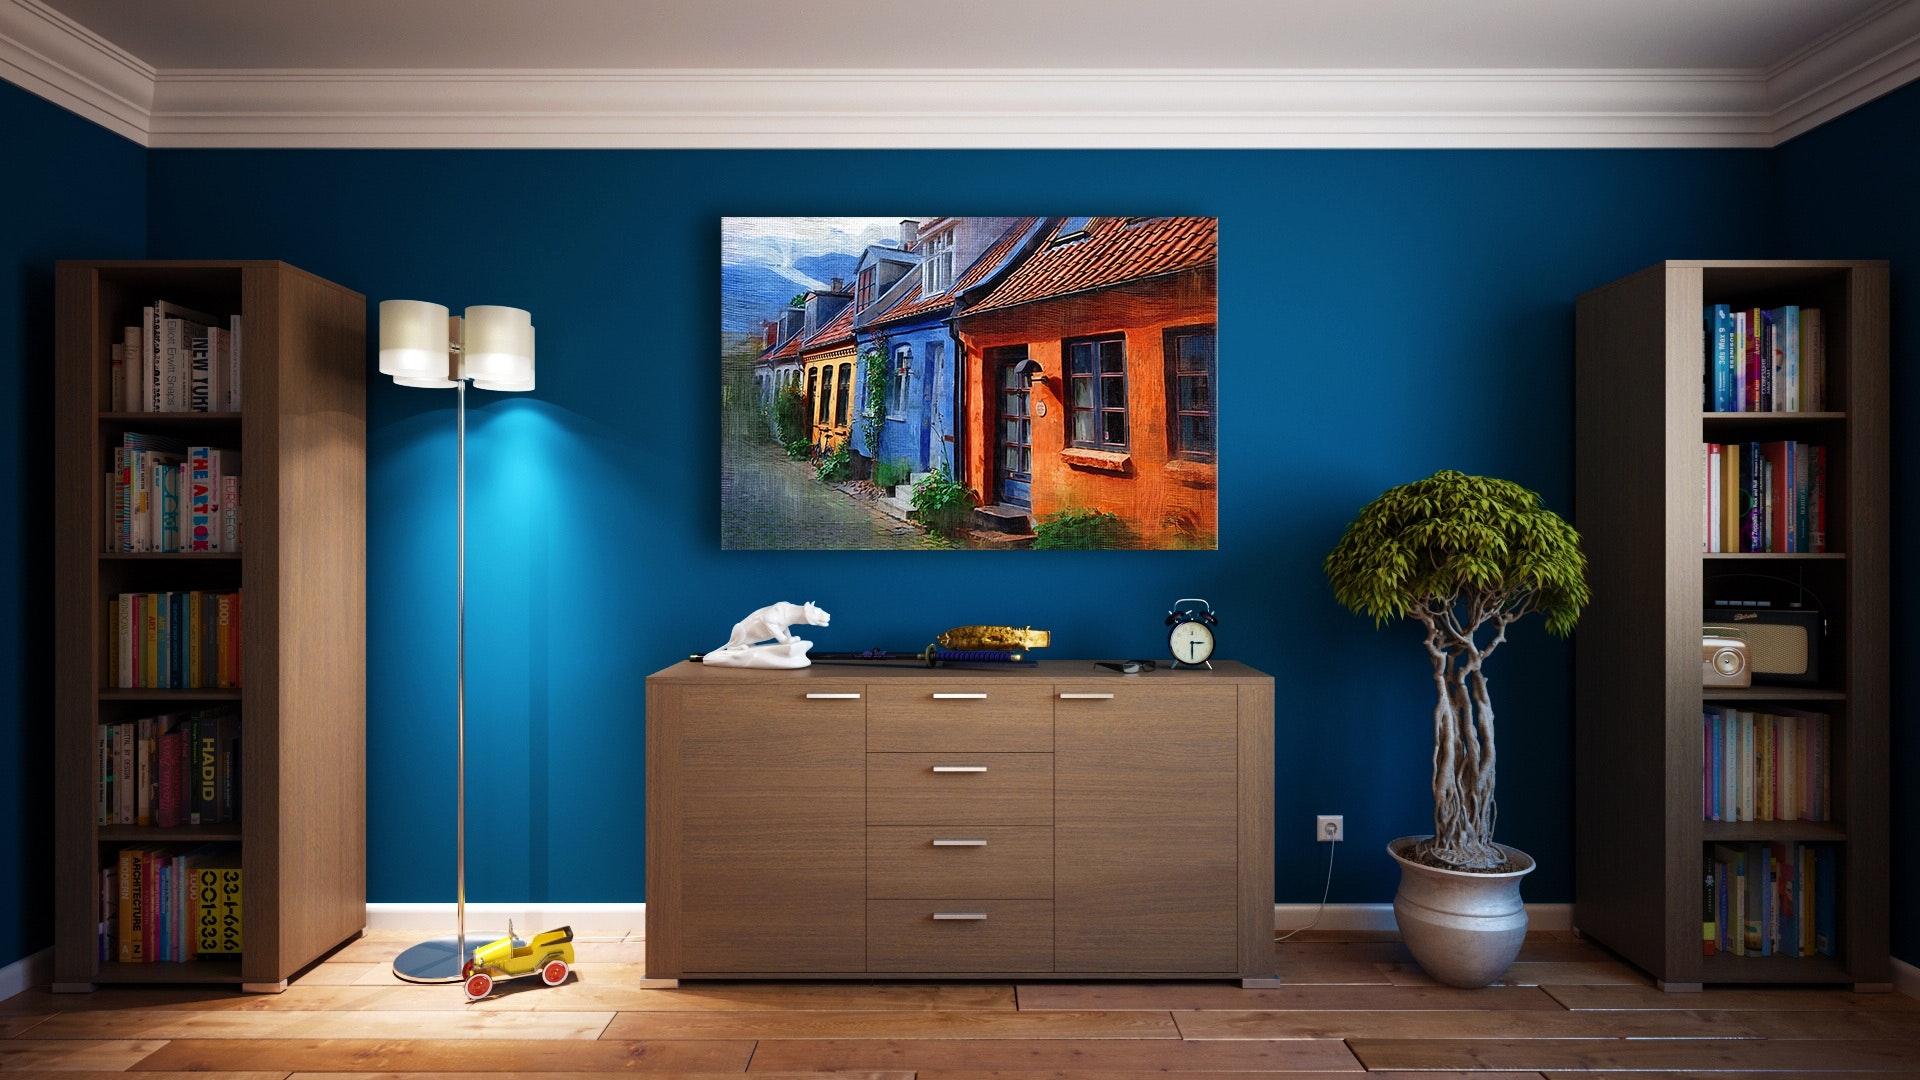 apartment-architecture-bookcase-271816.jpg